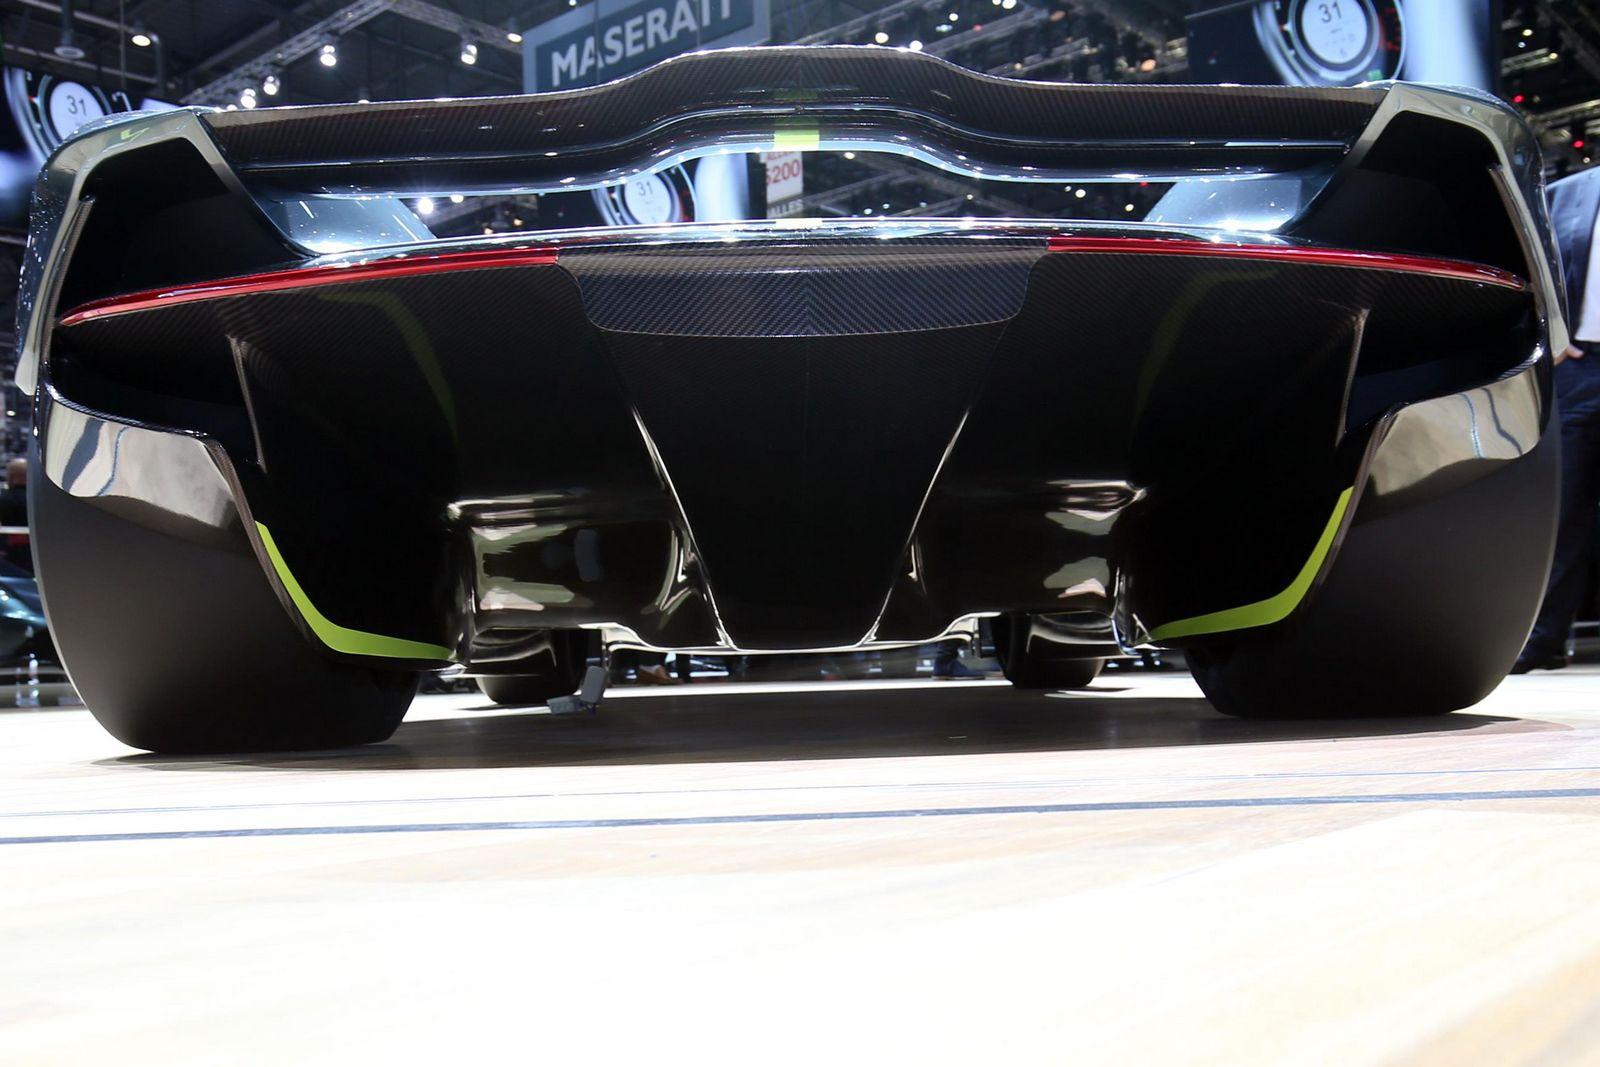 Aston2BMartin2BValkyrie2B 8 Γνώρισε τη Θεά Aston Martin Valkyrie! Aston Martin, Aston Martin Valkyrie, Hybrid, hypercar, Limited edition, Red Bull, supercars